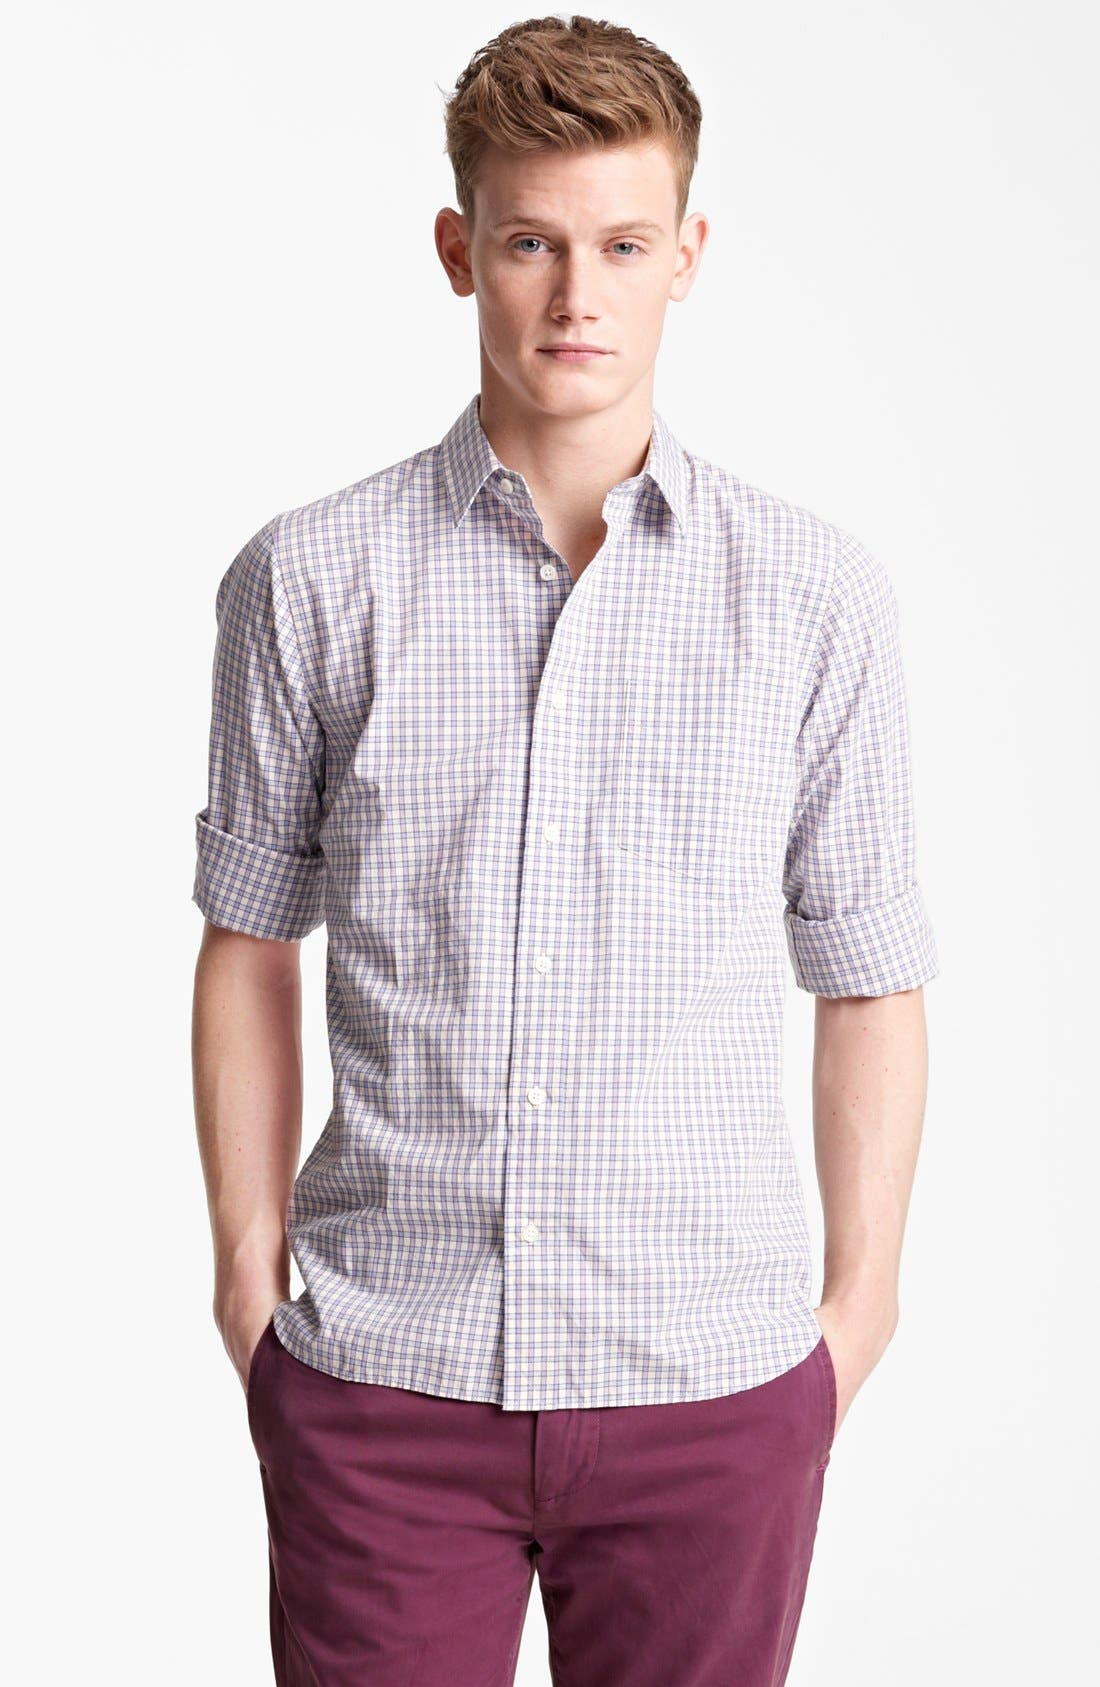 Main Image - Jack Spade 'Yates' Check Cotton Shirt